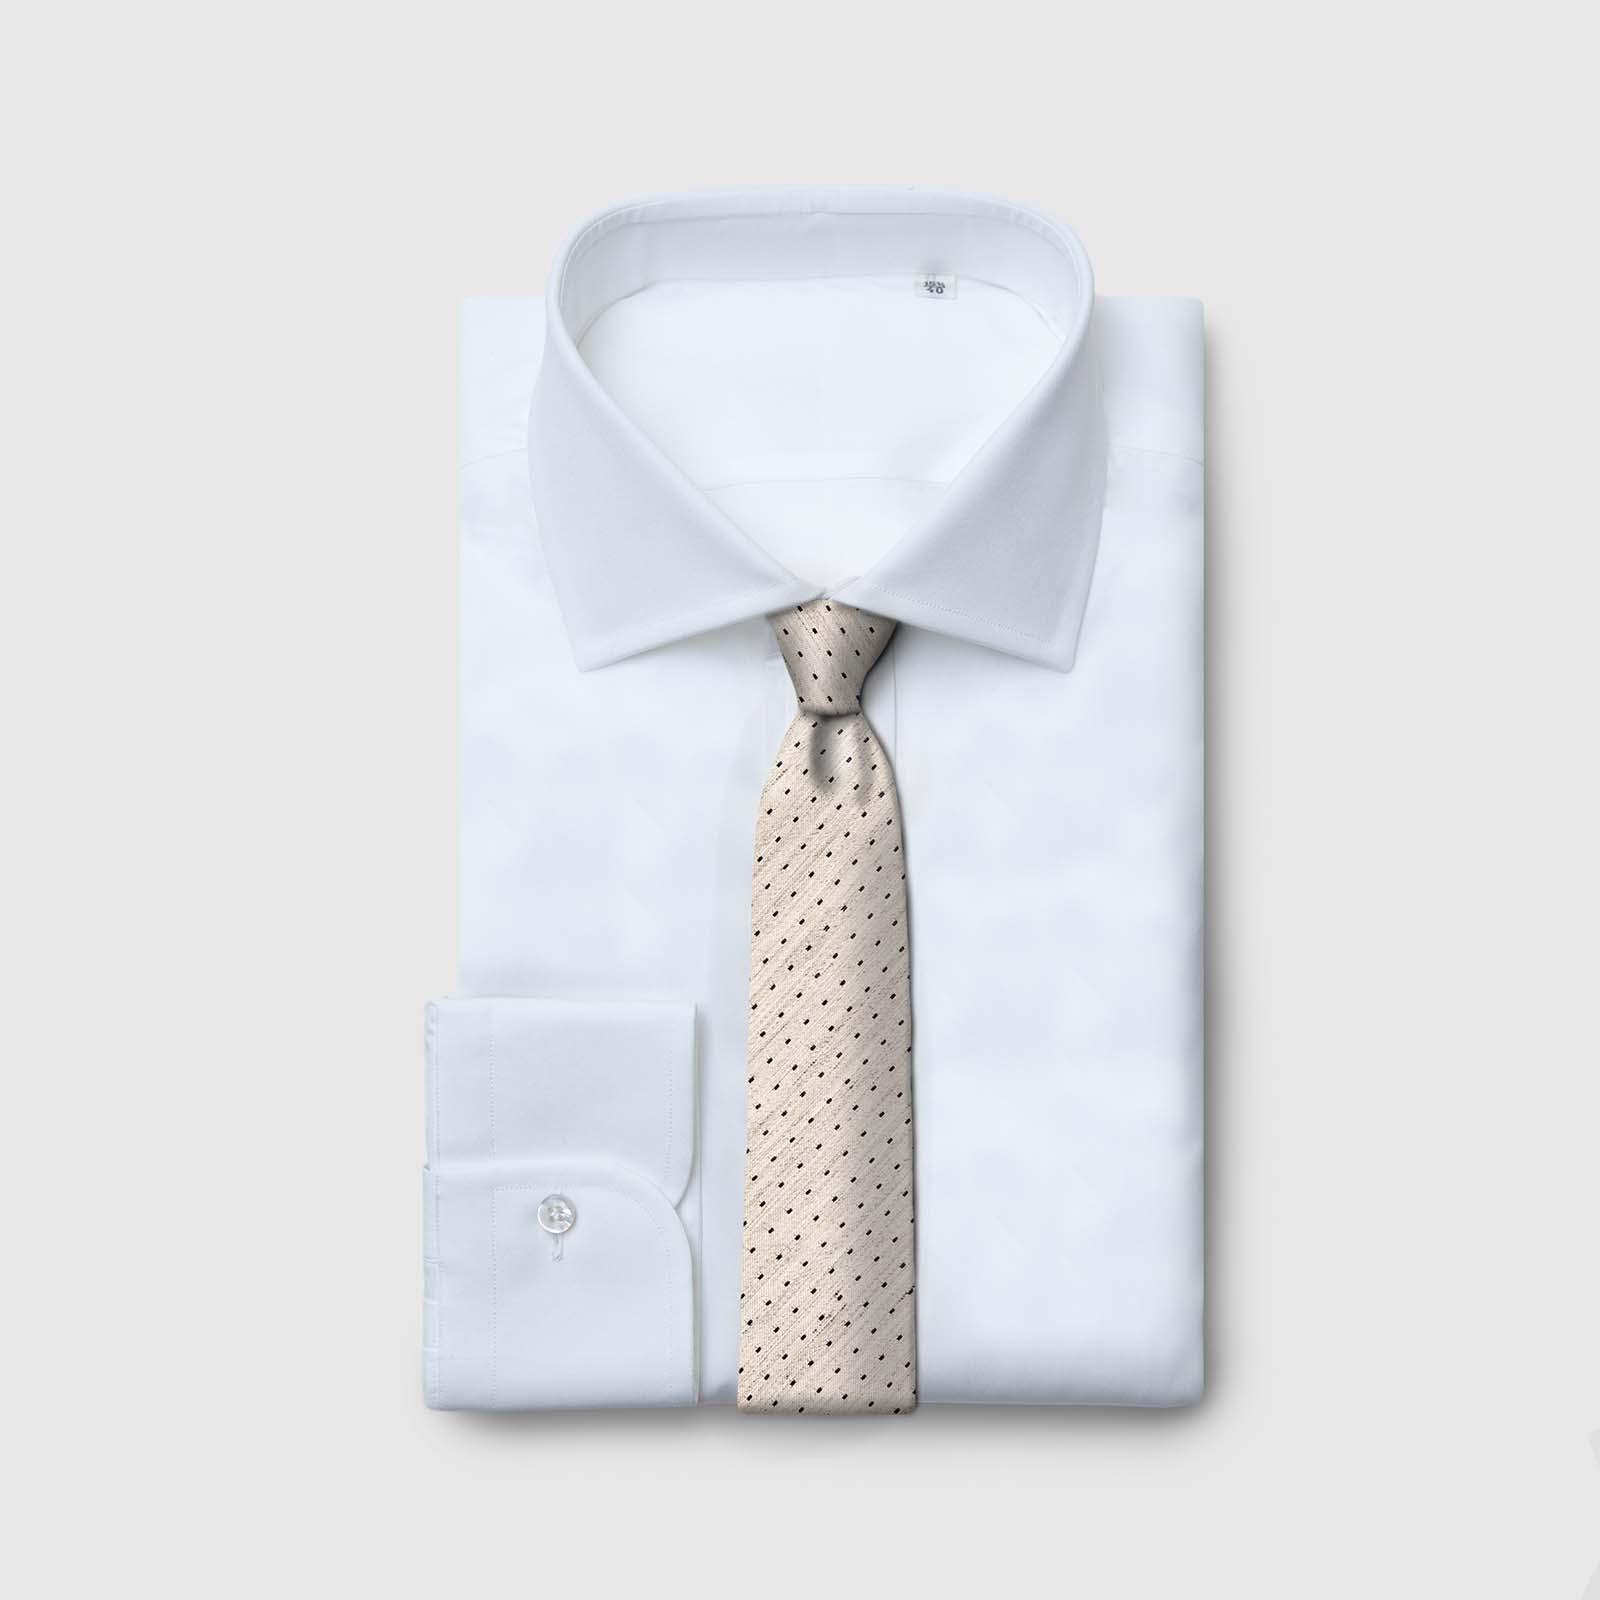 5 Fold beige tie with blue patterns